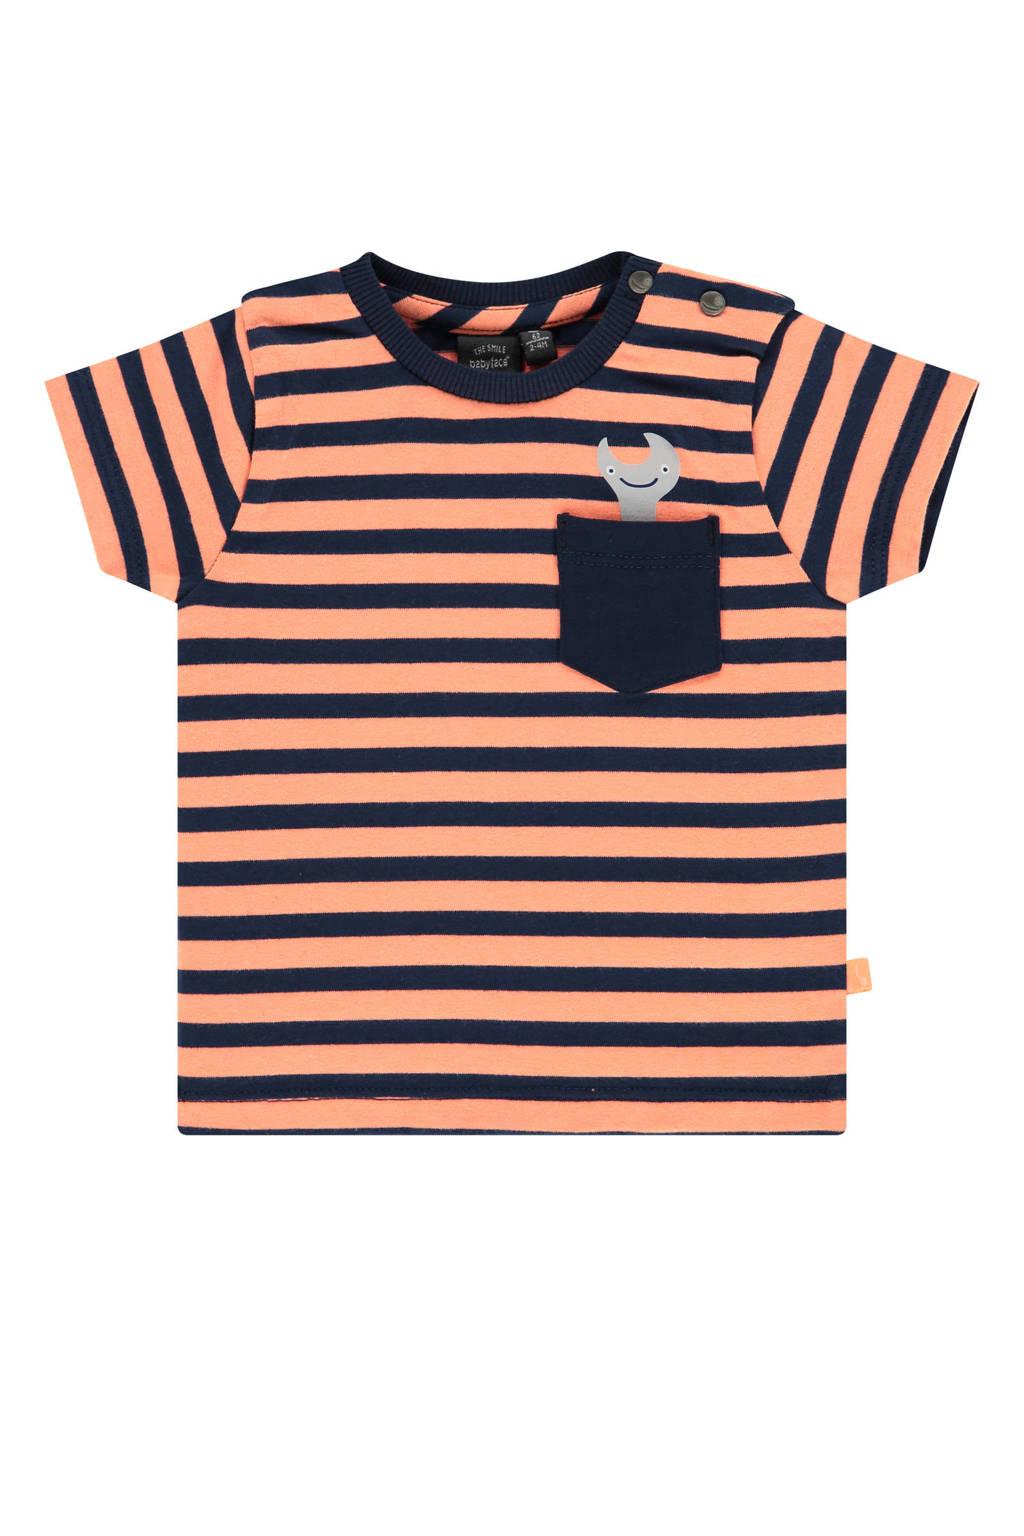 Babyface baby gestreept T-shirt neon oranje/donkerblauw